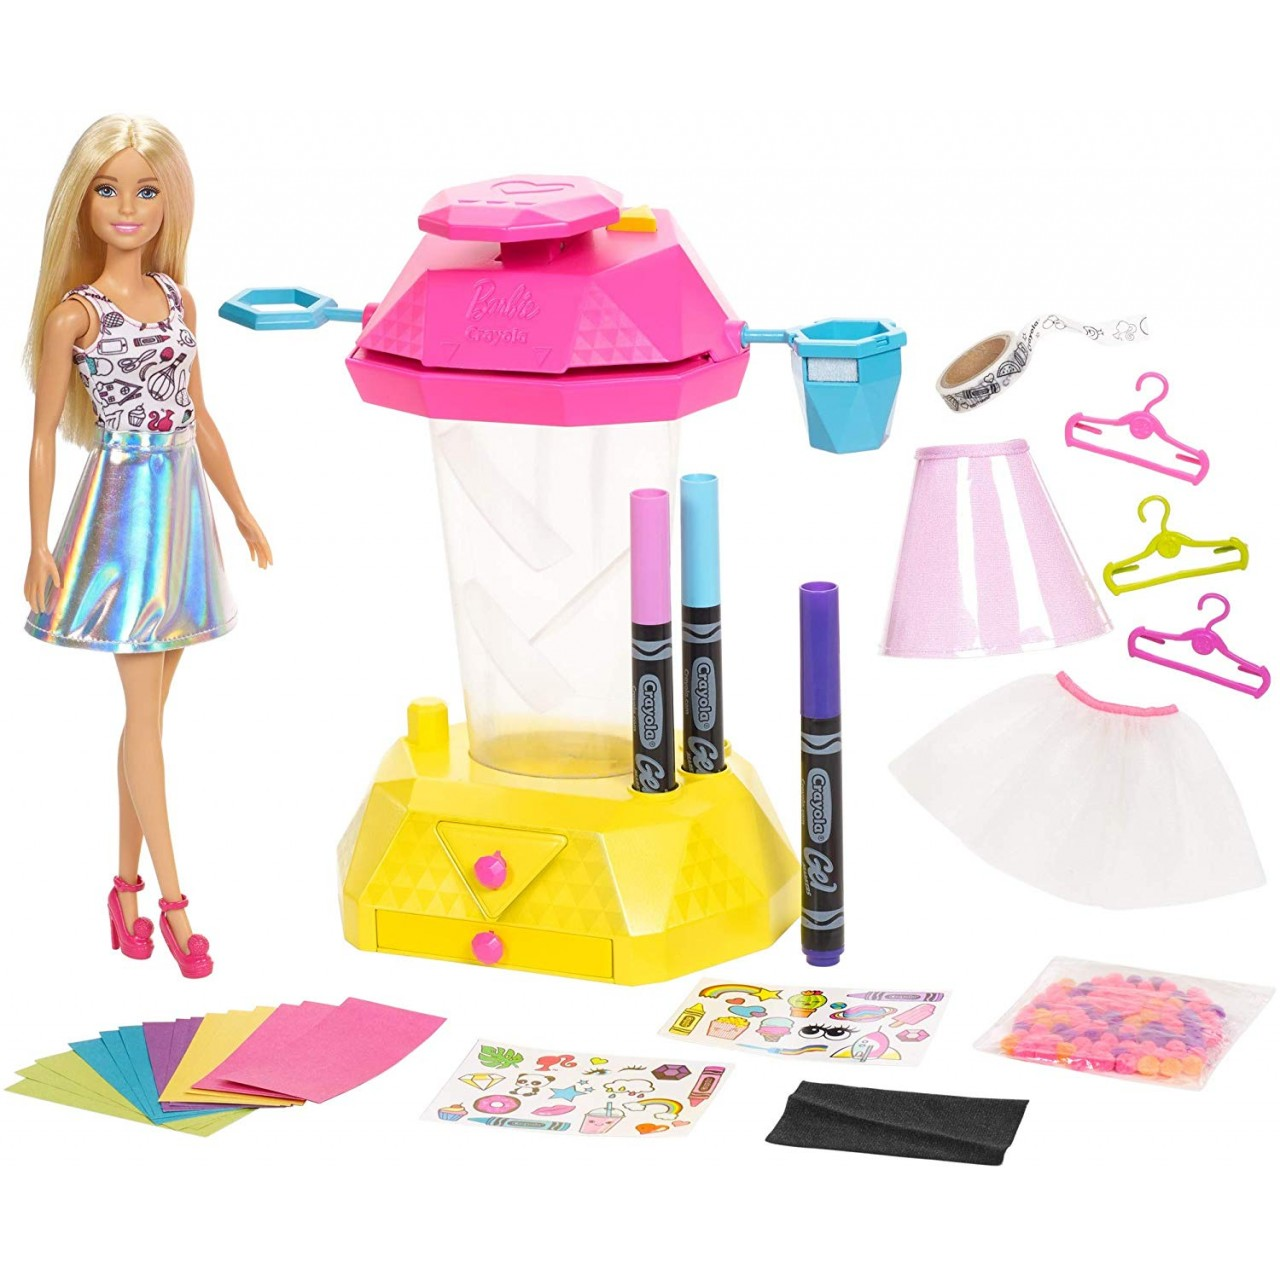 "Кукла Barbie Волшебное конфетти серия ""Crayola"" (FRP02)"